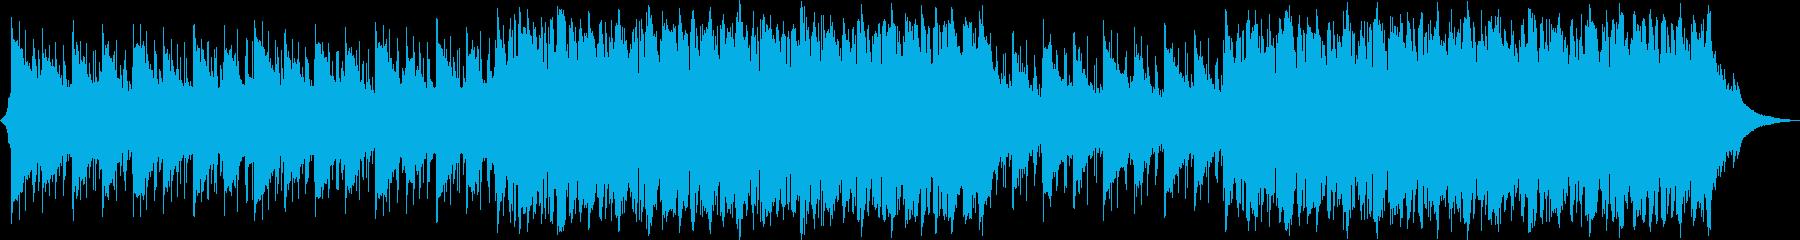 Digital Harmonyの再生済みの波形